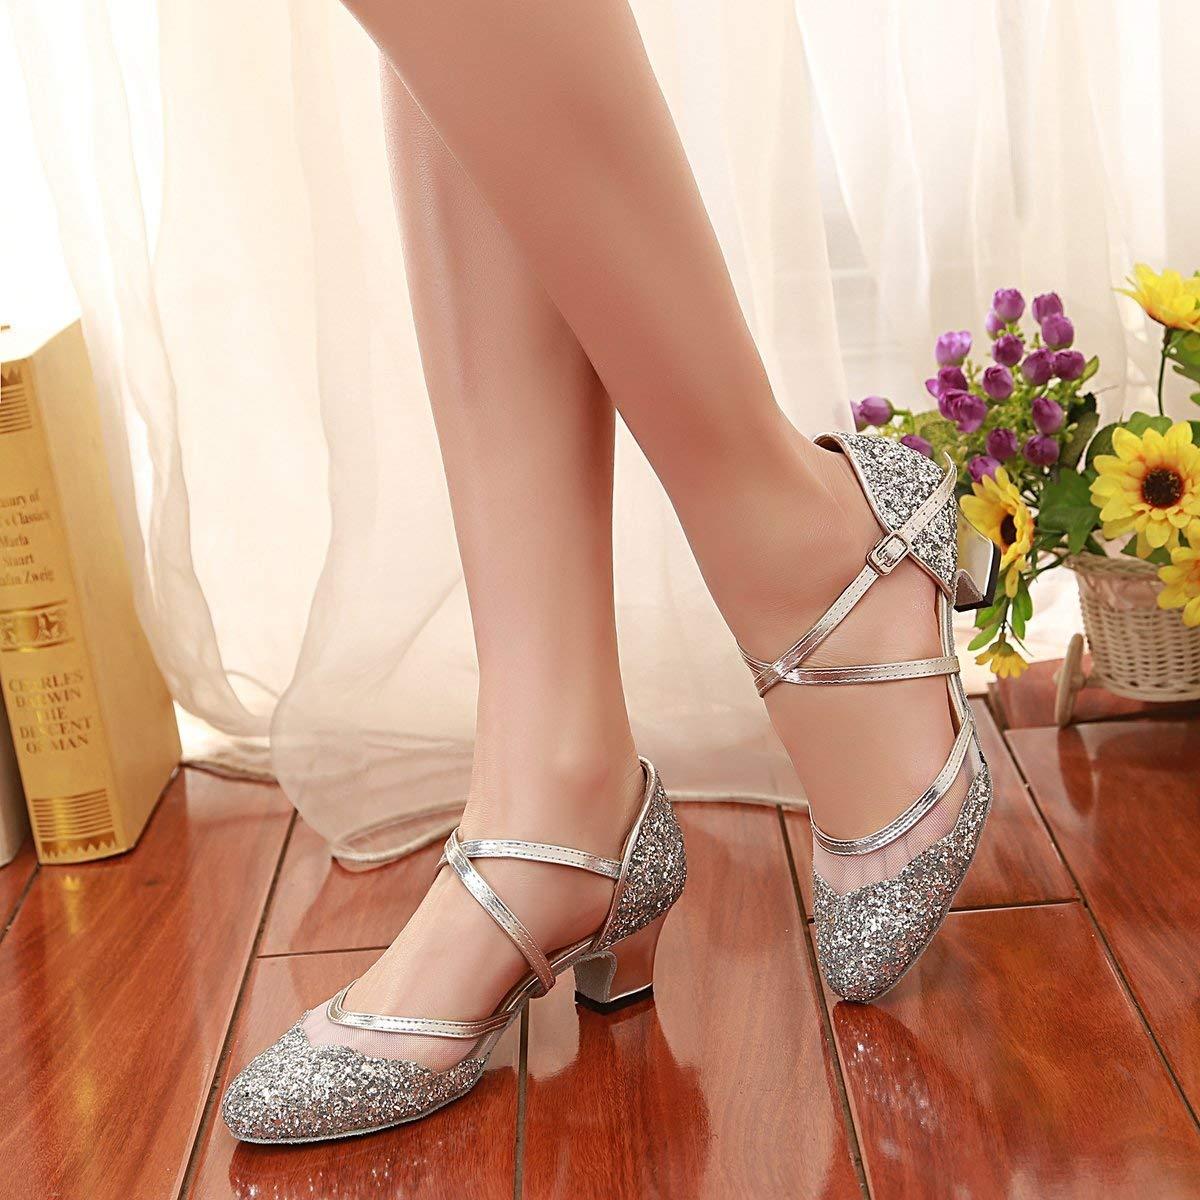 Qiusa Frauen Frauen Frauen Geschlossene Zehe Silber Glitter Latin Dance Schuhe Hochzeit Pumps UK 7 (Farbe   -, Größe   -) 5ed6a3